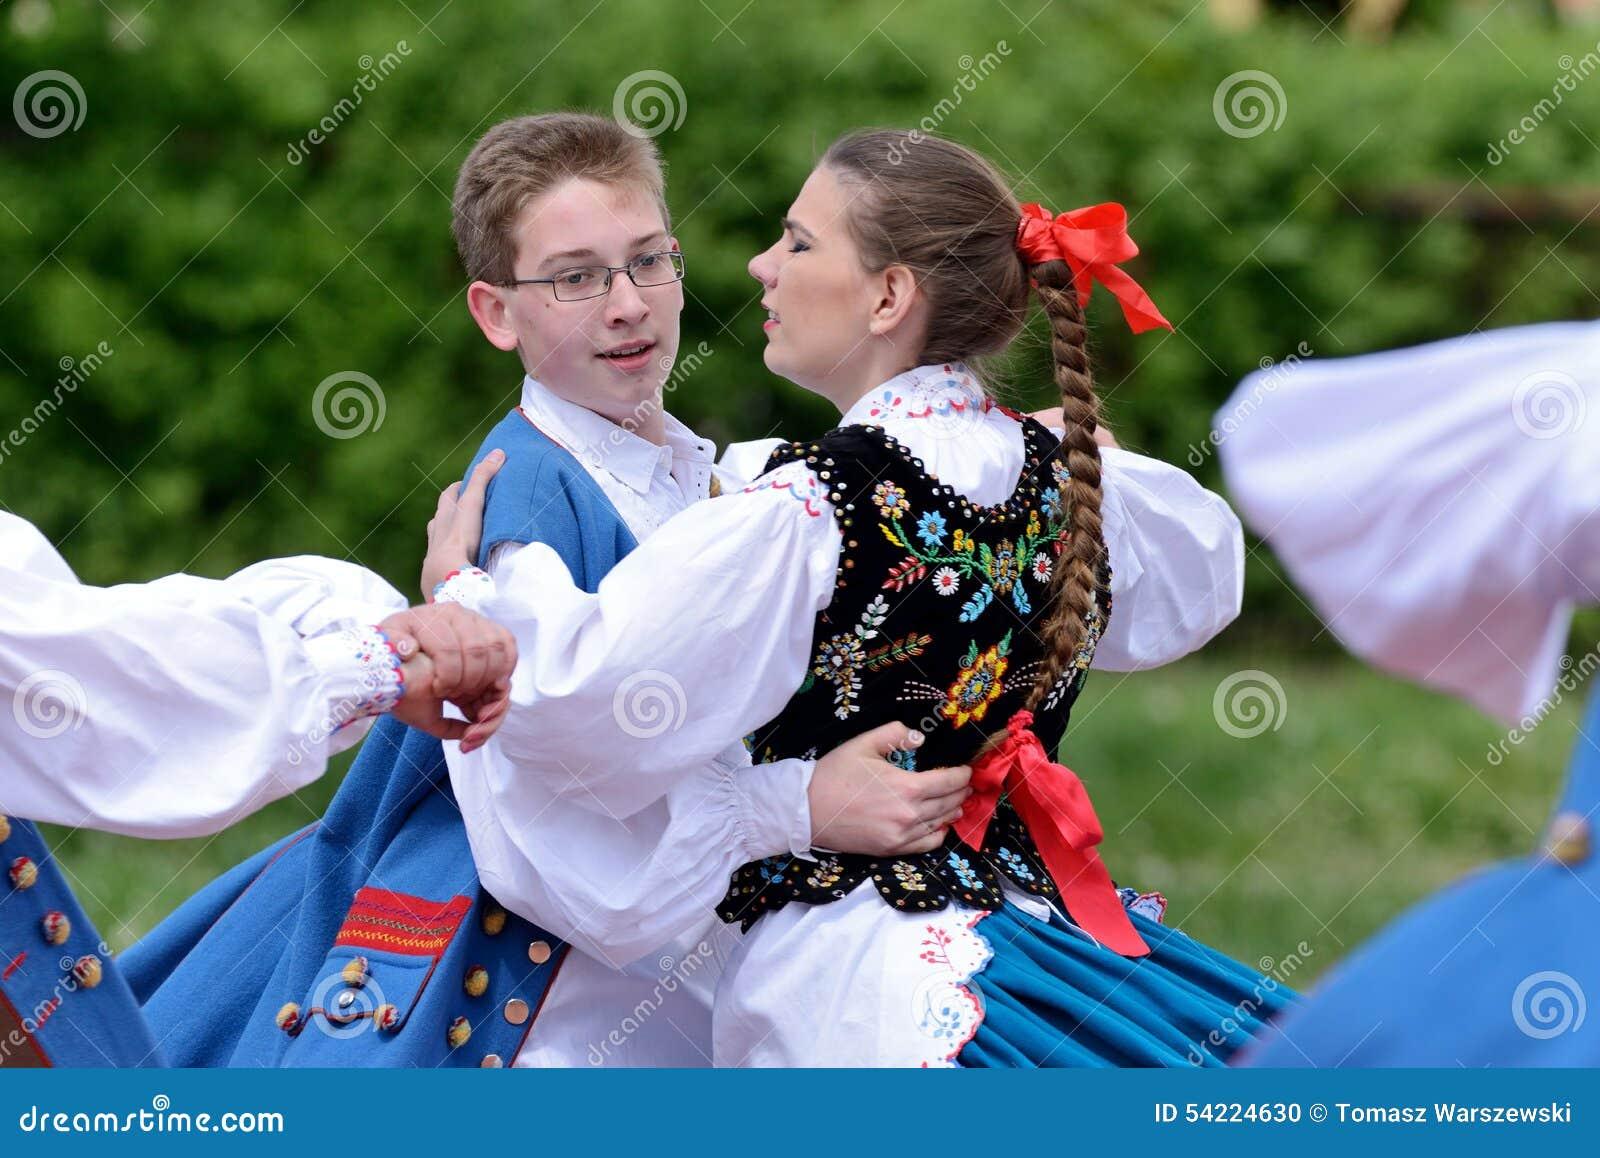 Danza Popular Tradicional Polaca Imagen Editorial